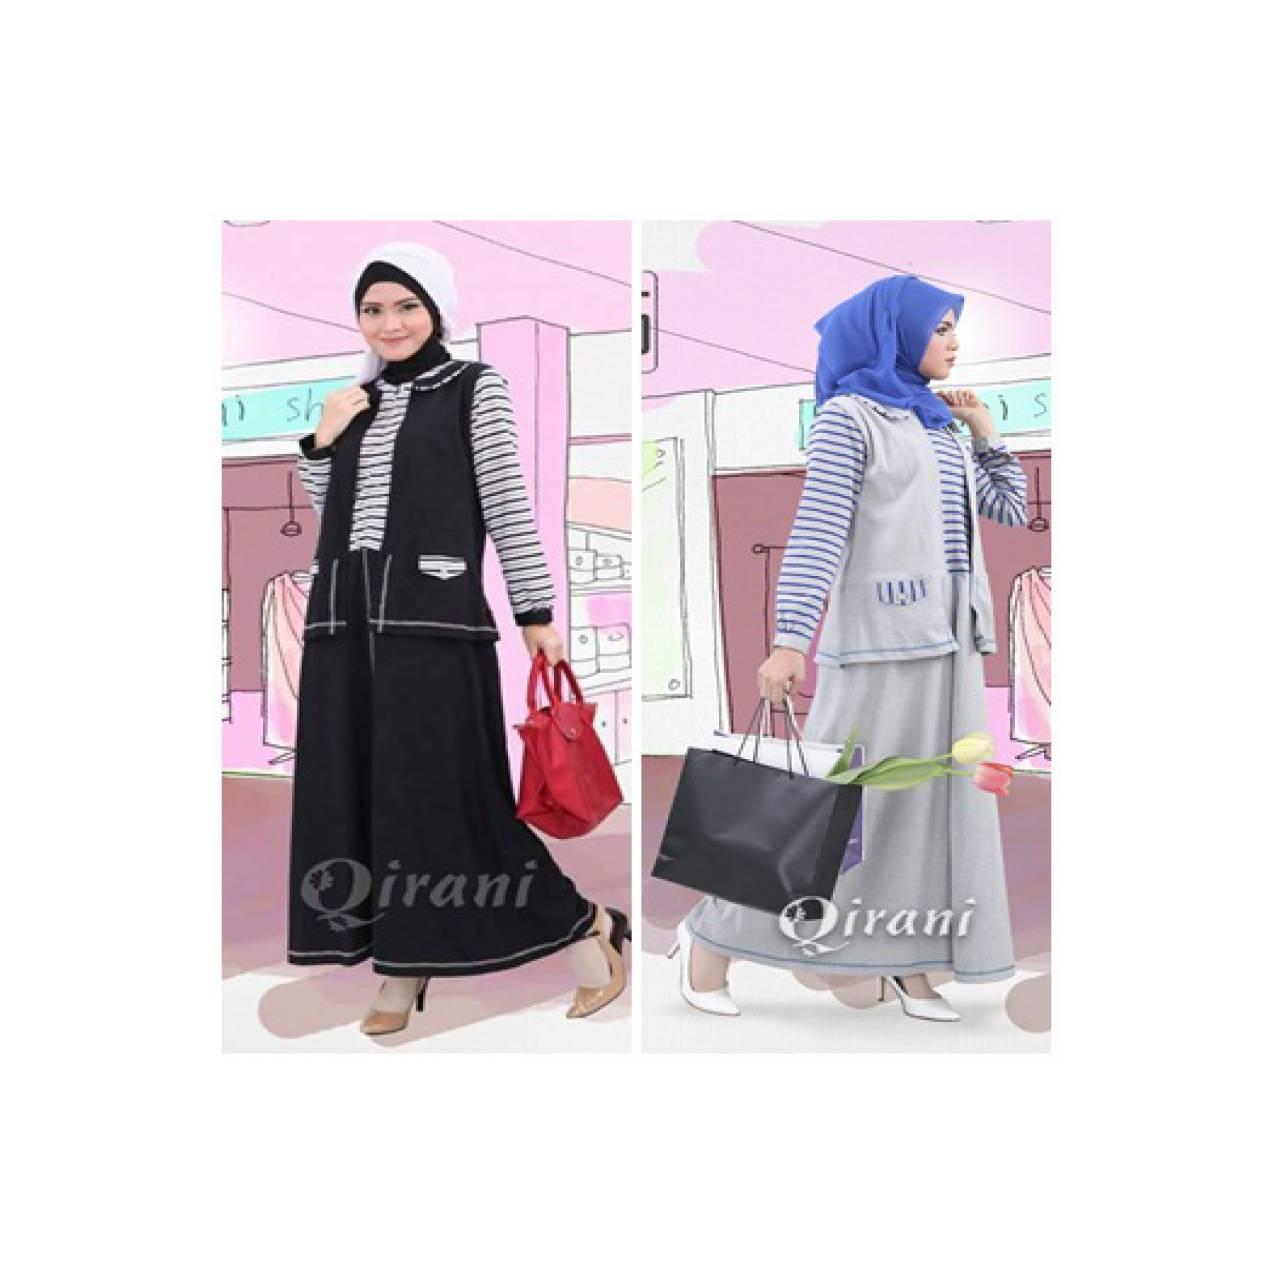 Qirani Qdf Fresh 25 - Gamis Catton Combet - Jual Baju Muslim Original